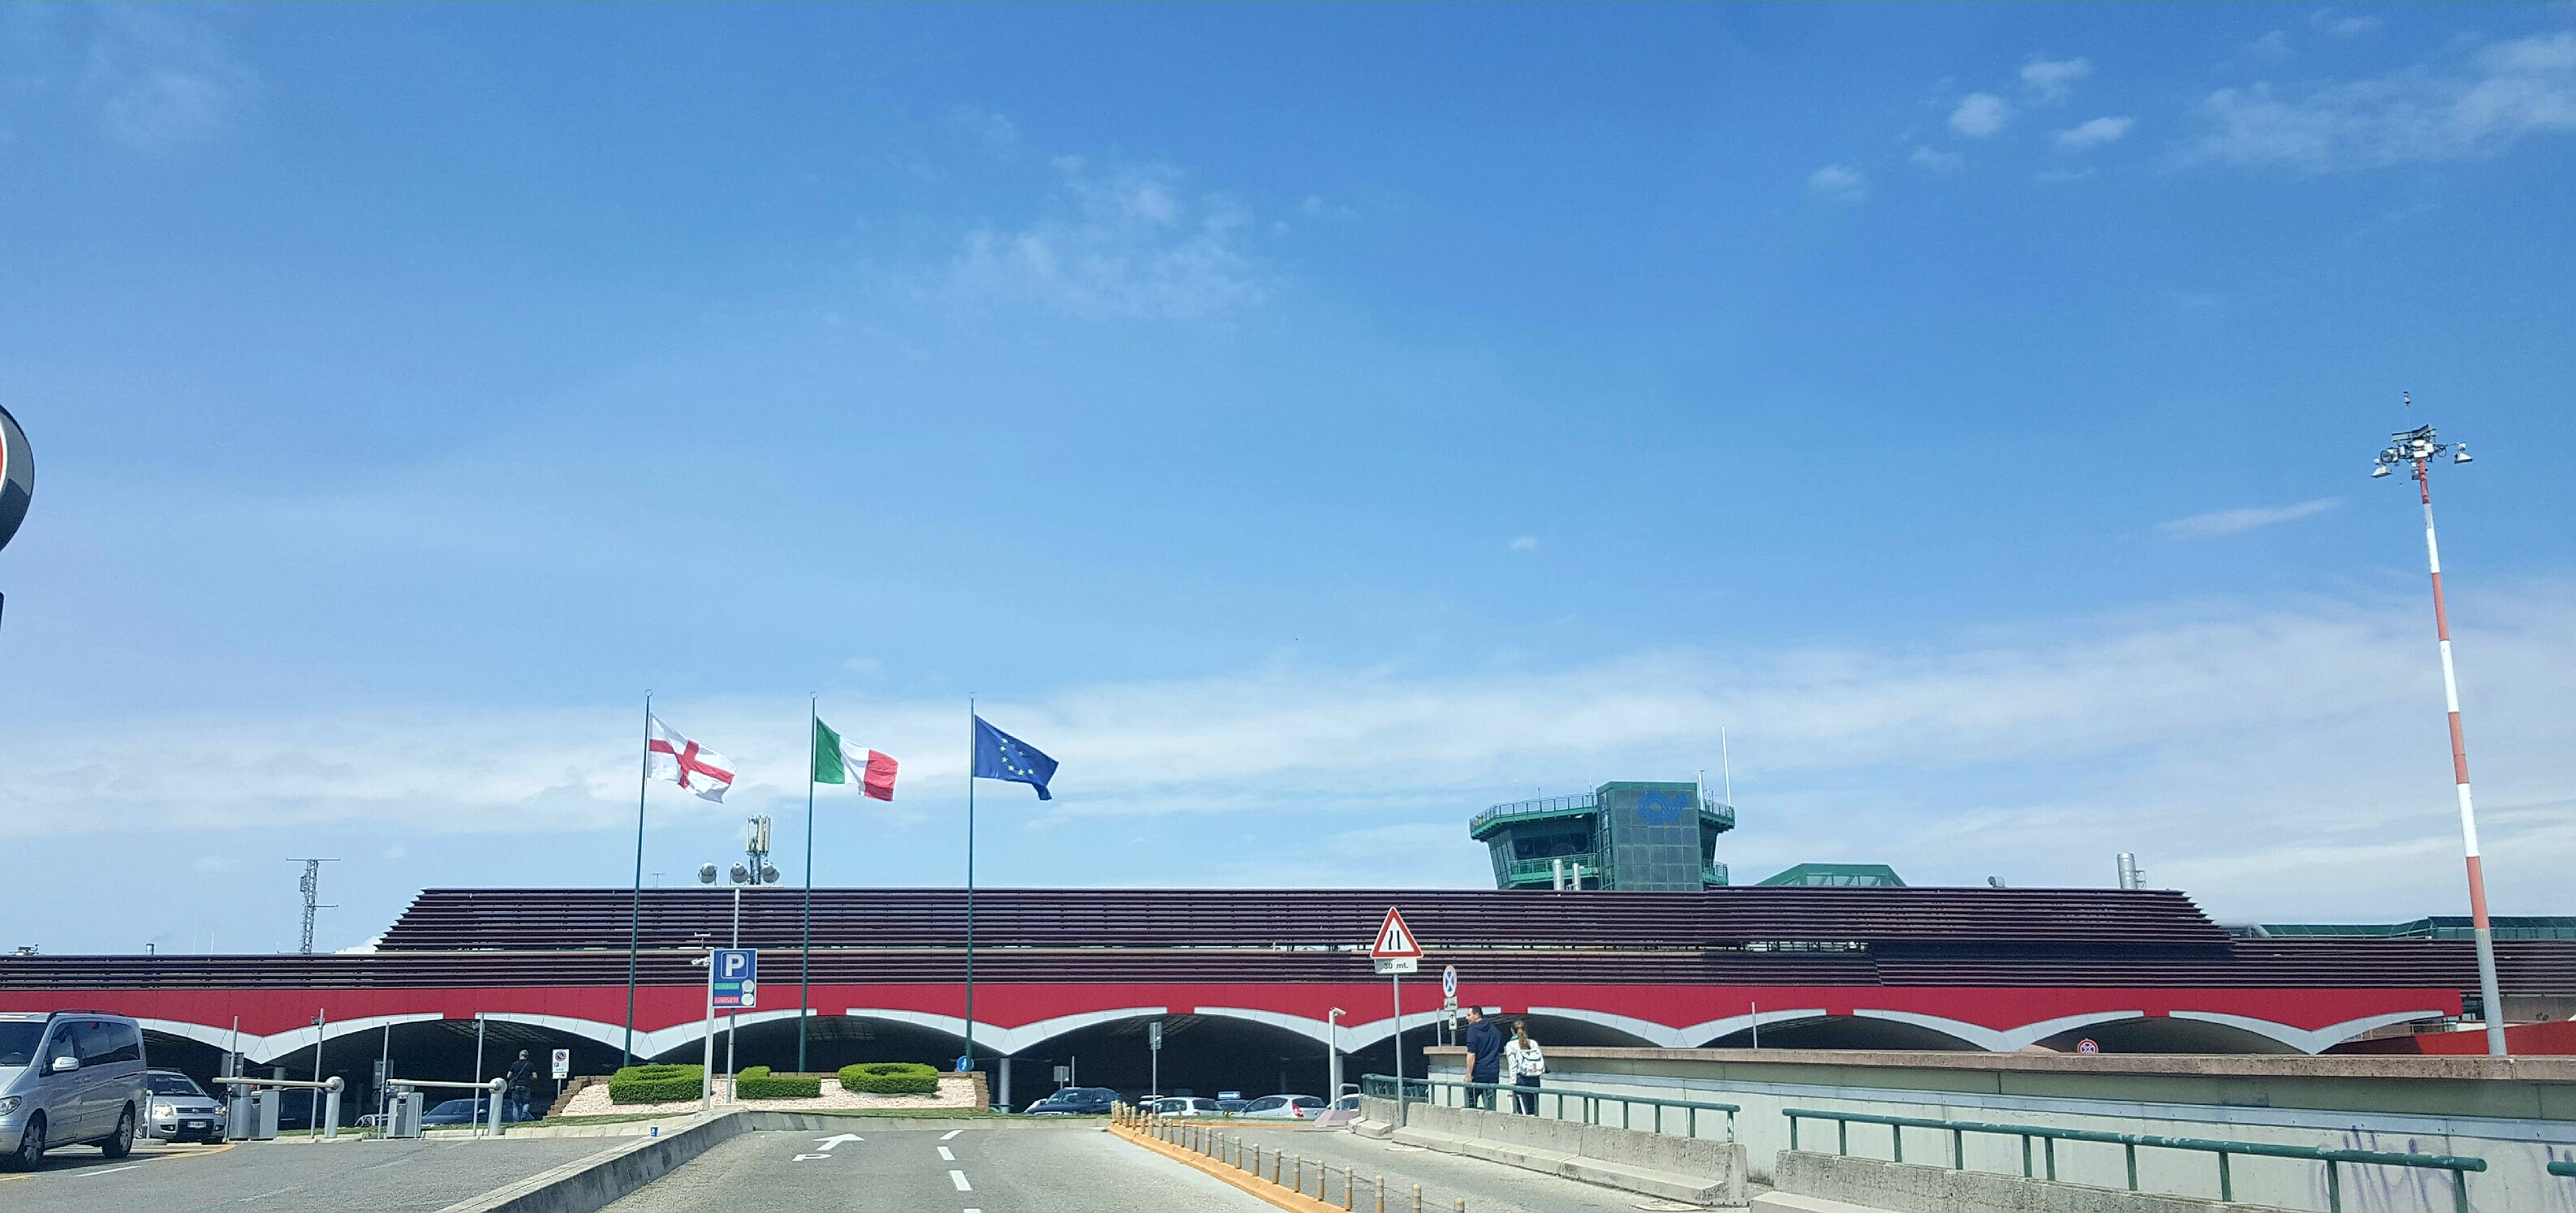 Aeroporto Di Bologna : File aeroporto di bologna ingresso eg wikimedia commons